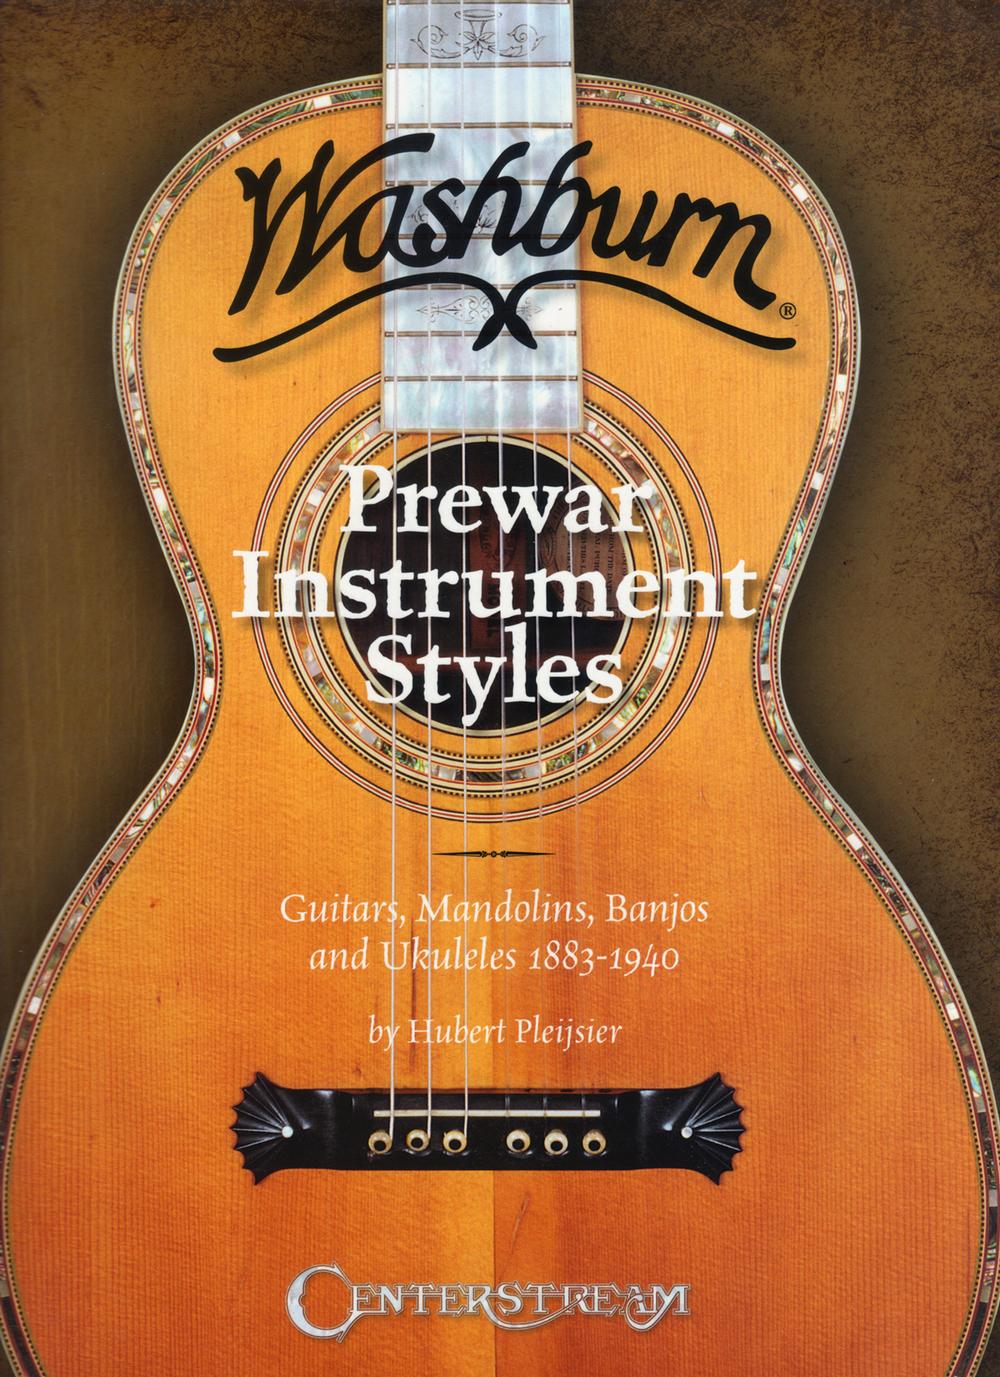 Washburn Pre-War Instrument Styles: Guitars, Mandolins, Banjos and Ukuleles 1883-1940